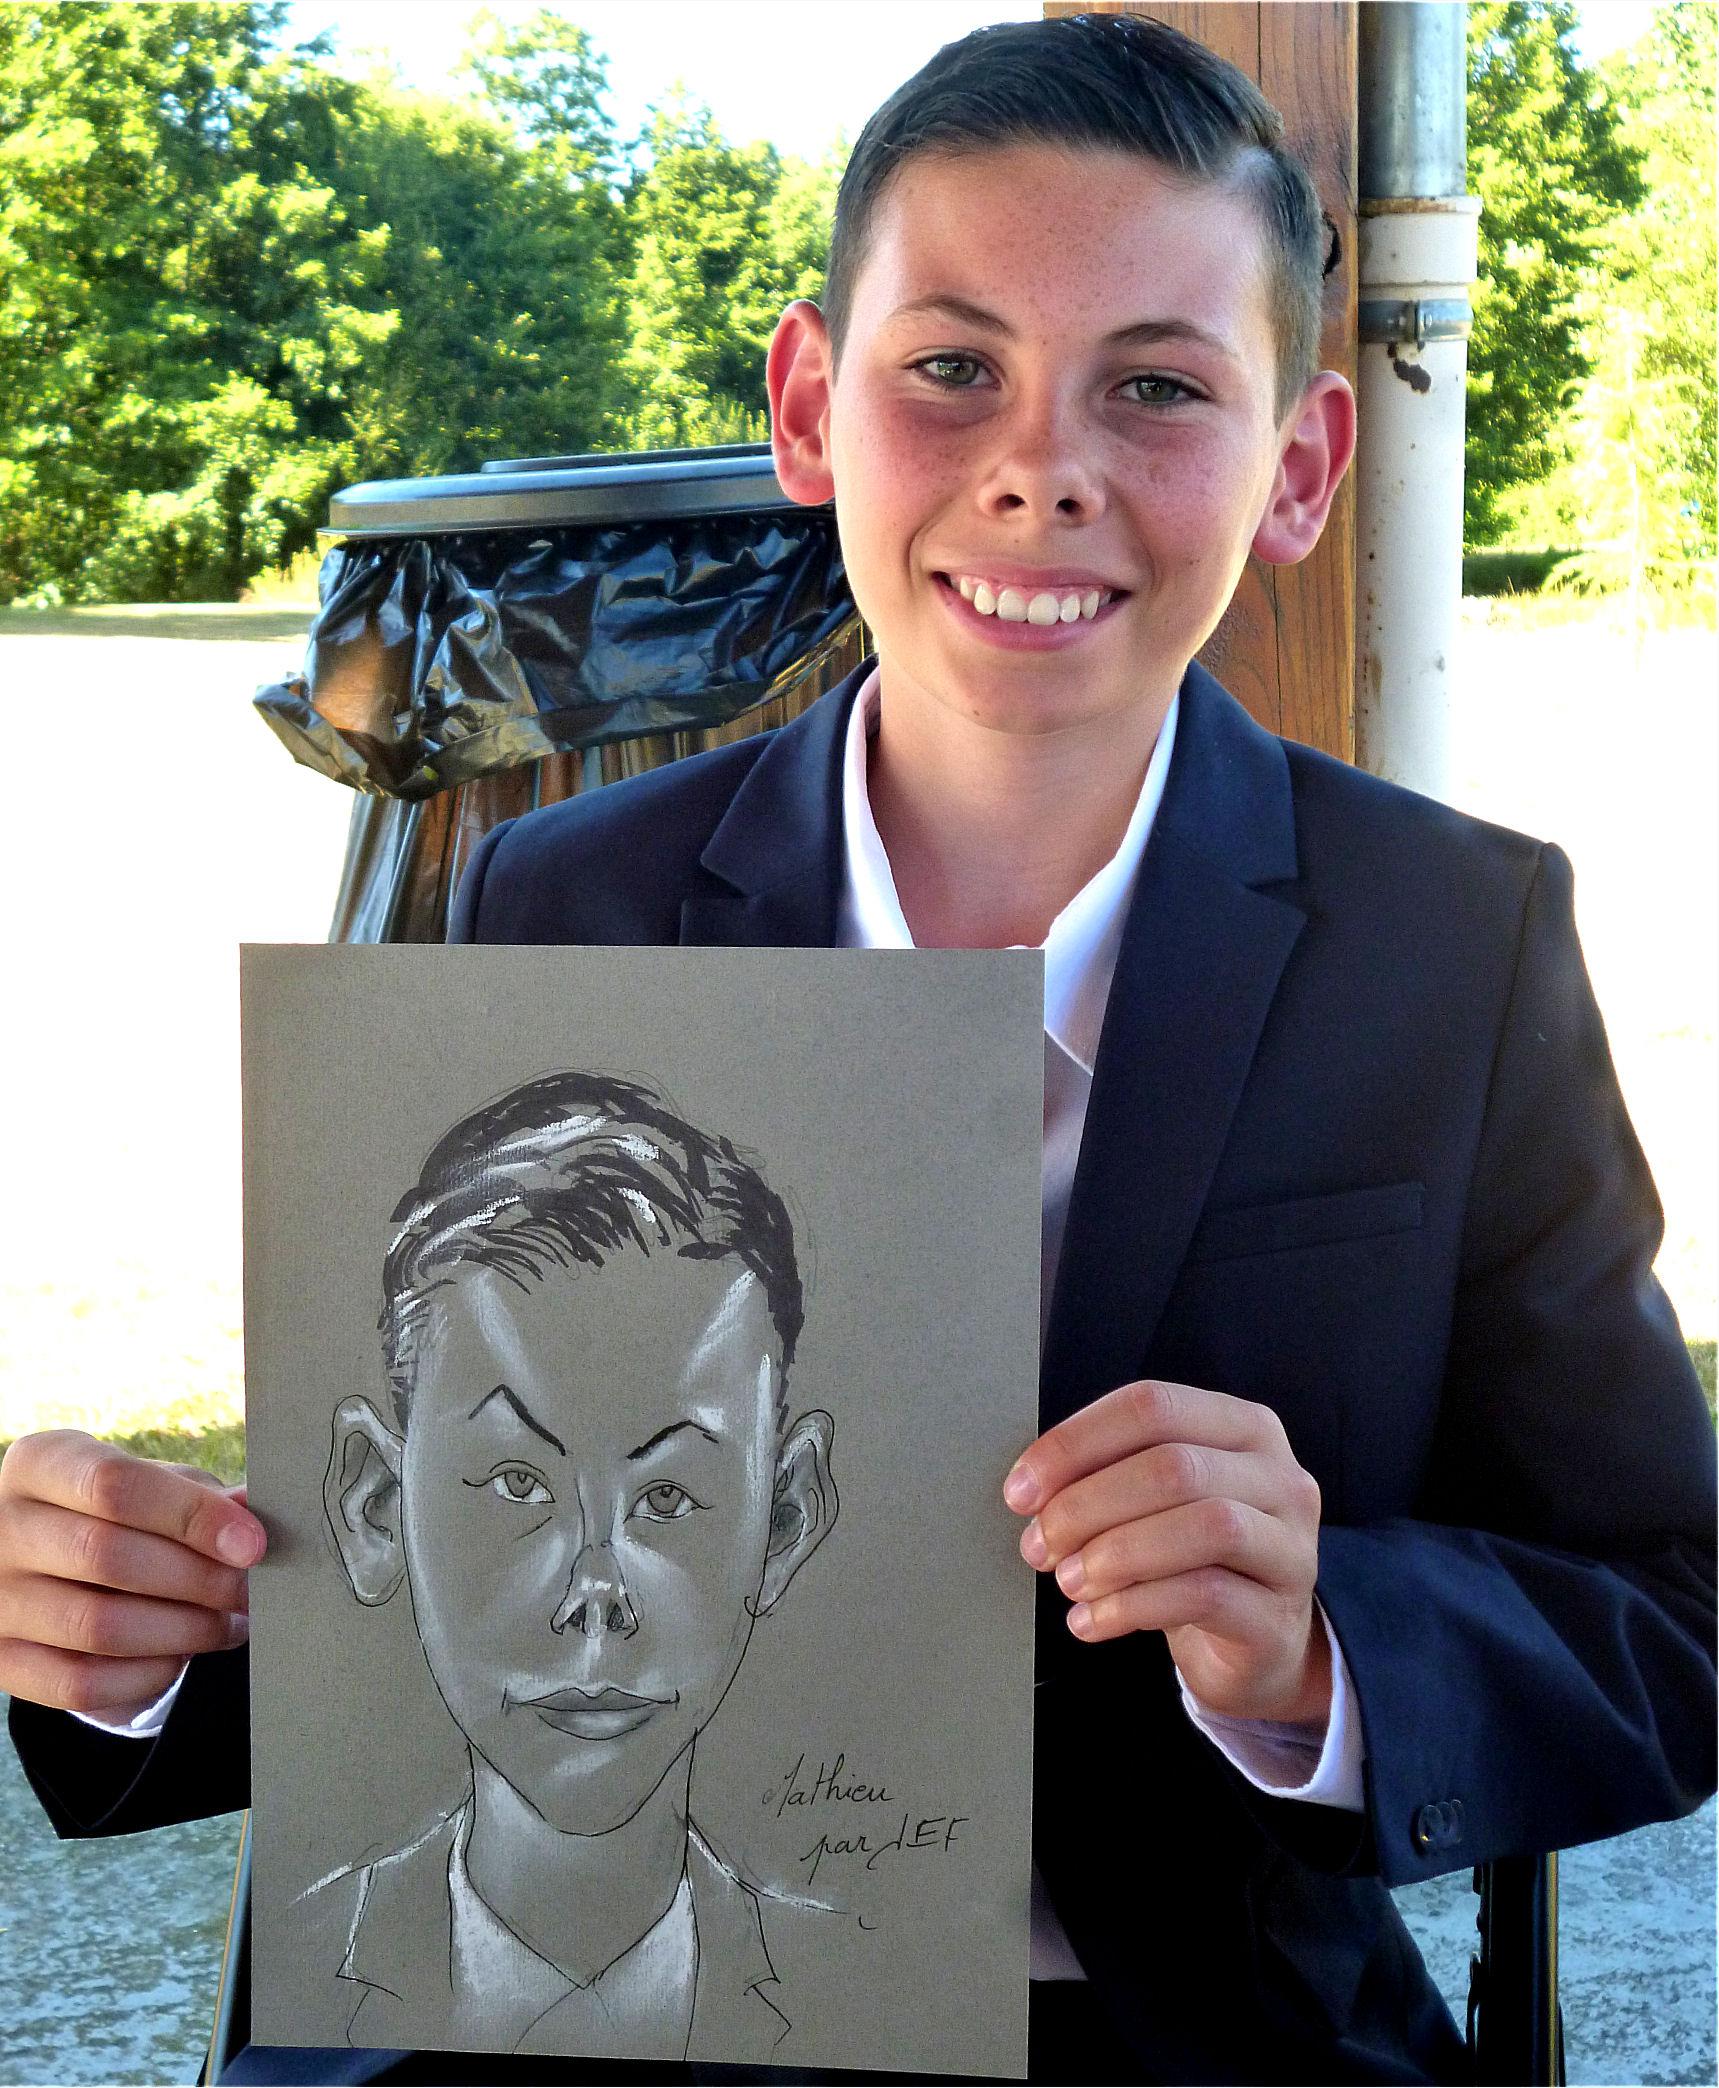 Mathieu caricature de Jef